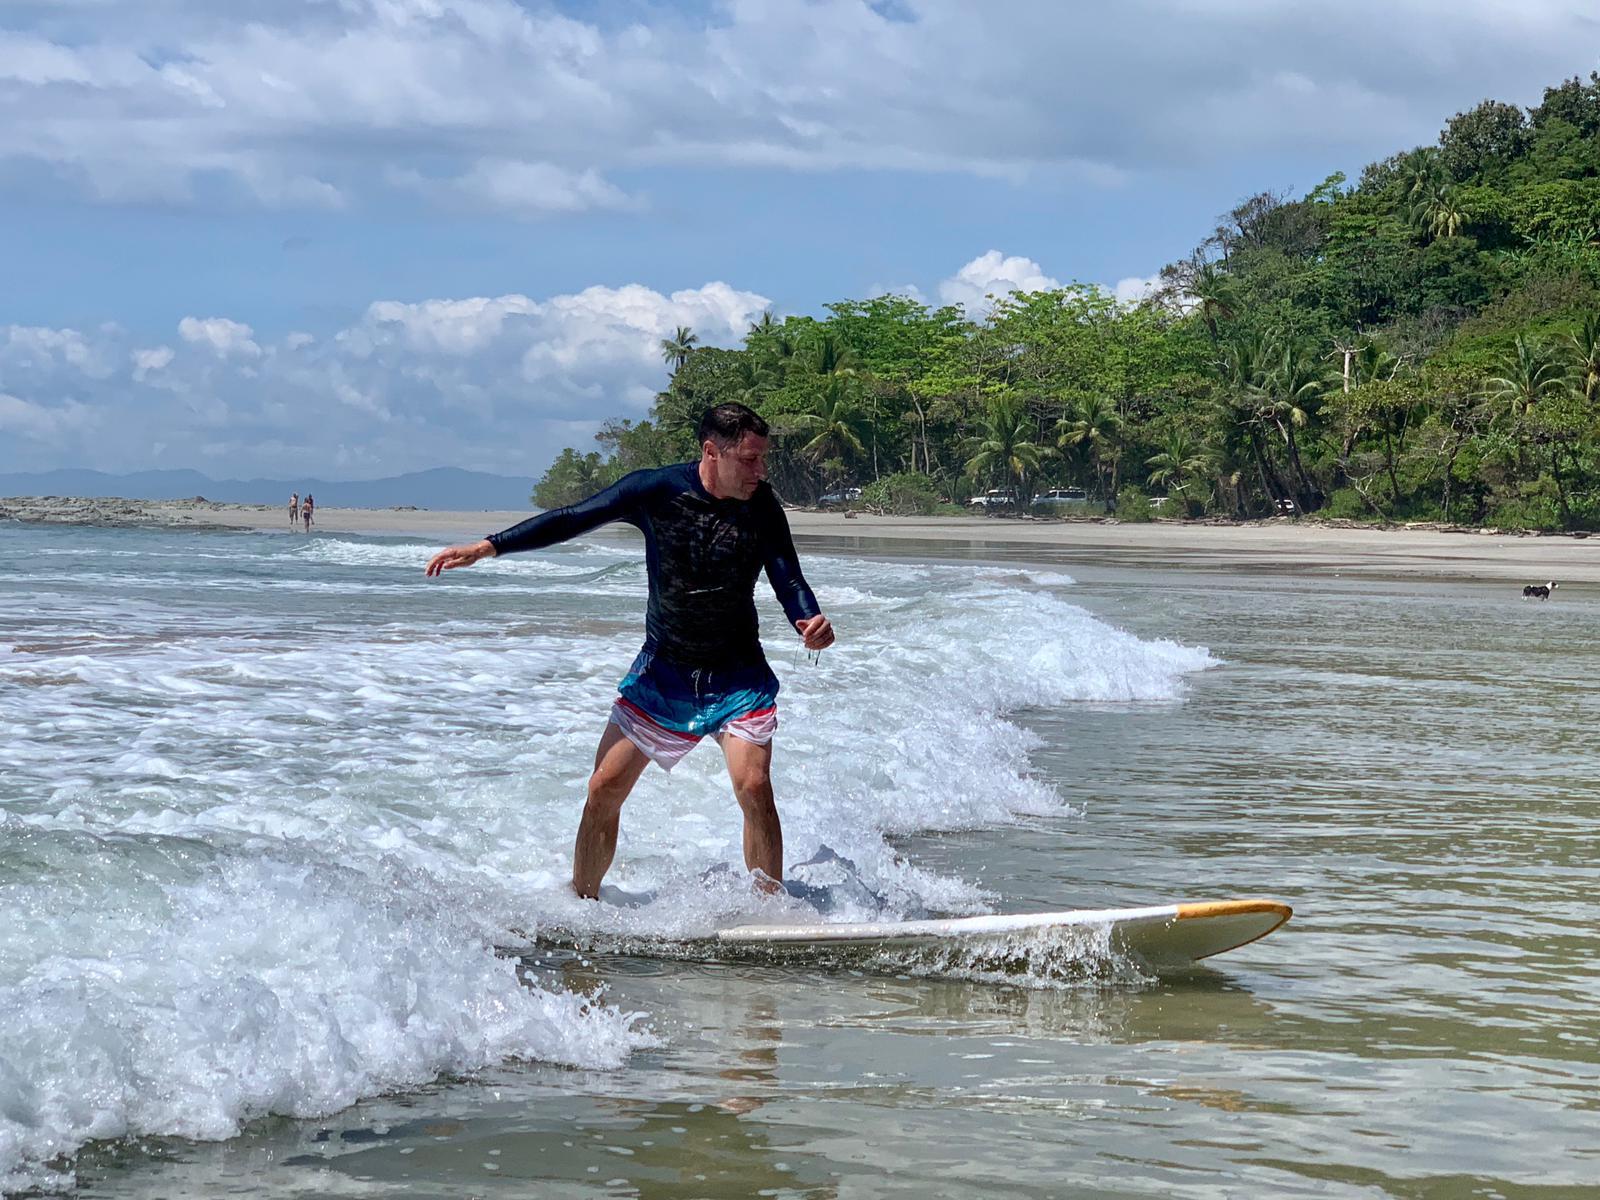 Peter Tibble of JetSet World Travel masters the waves in Santa Teresa.